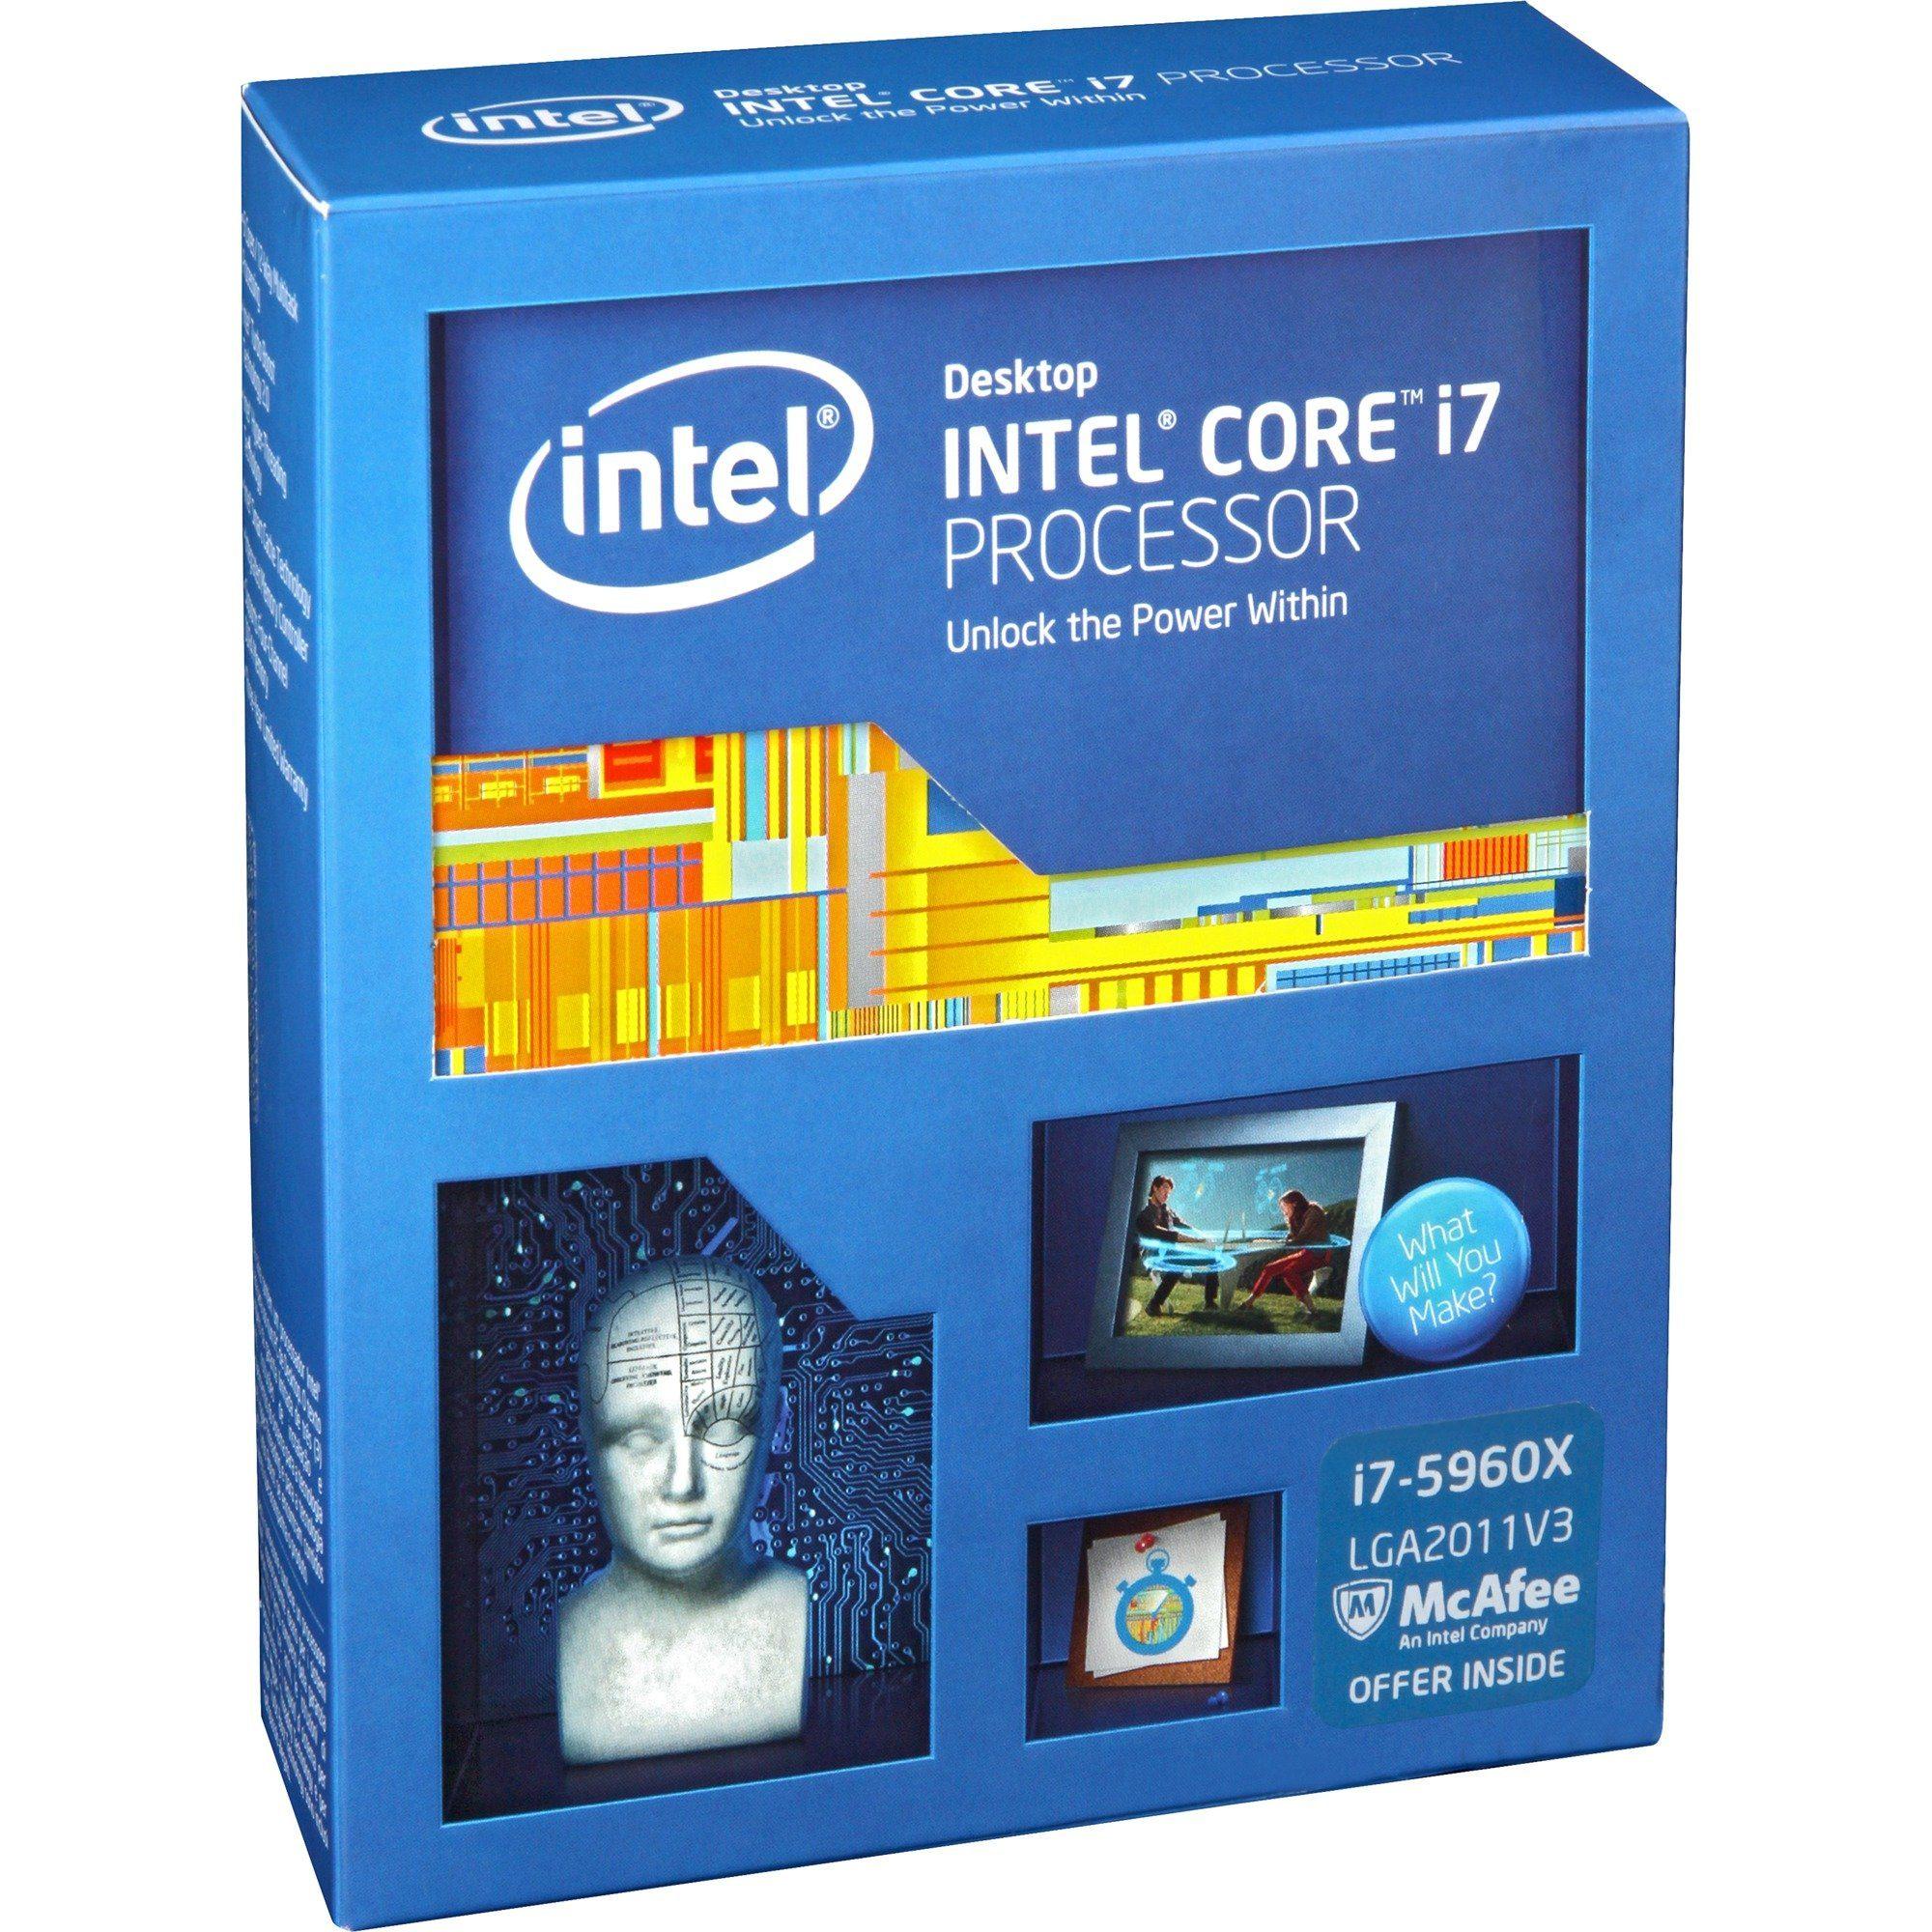 Intel® Prozessor »Core(TM) i7-5960X«